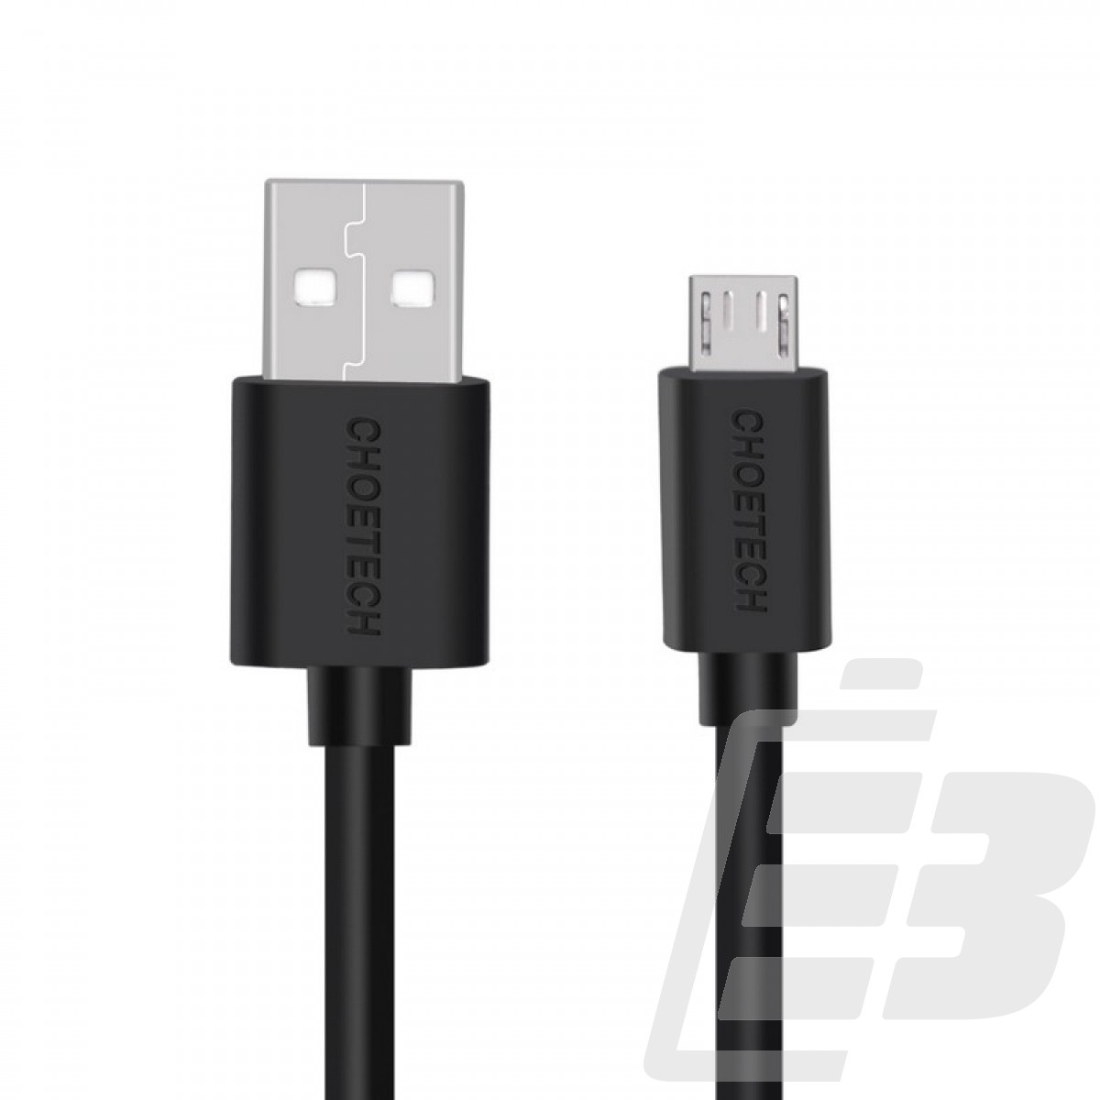 Choetech USB 2.0 to Micro USB_1